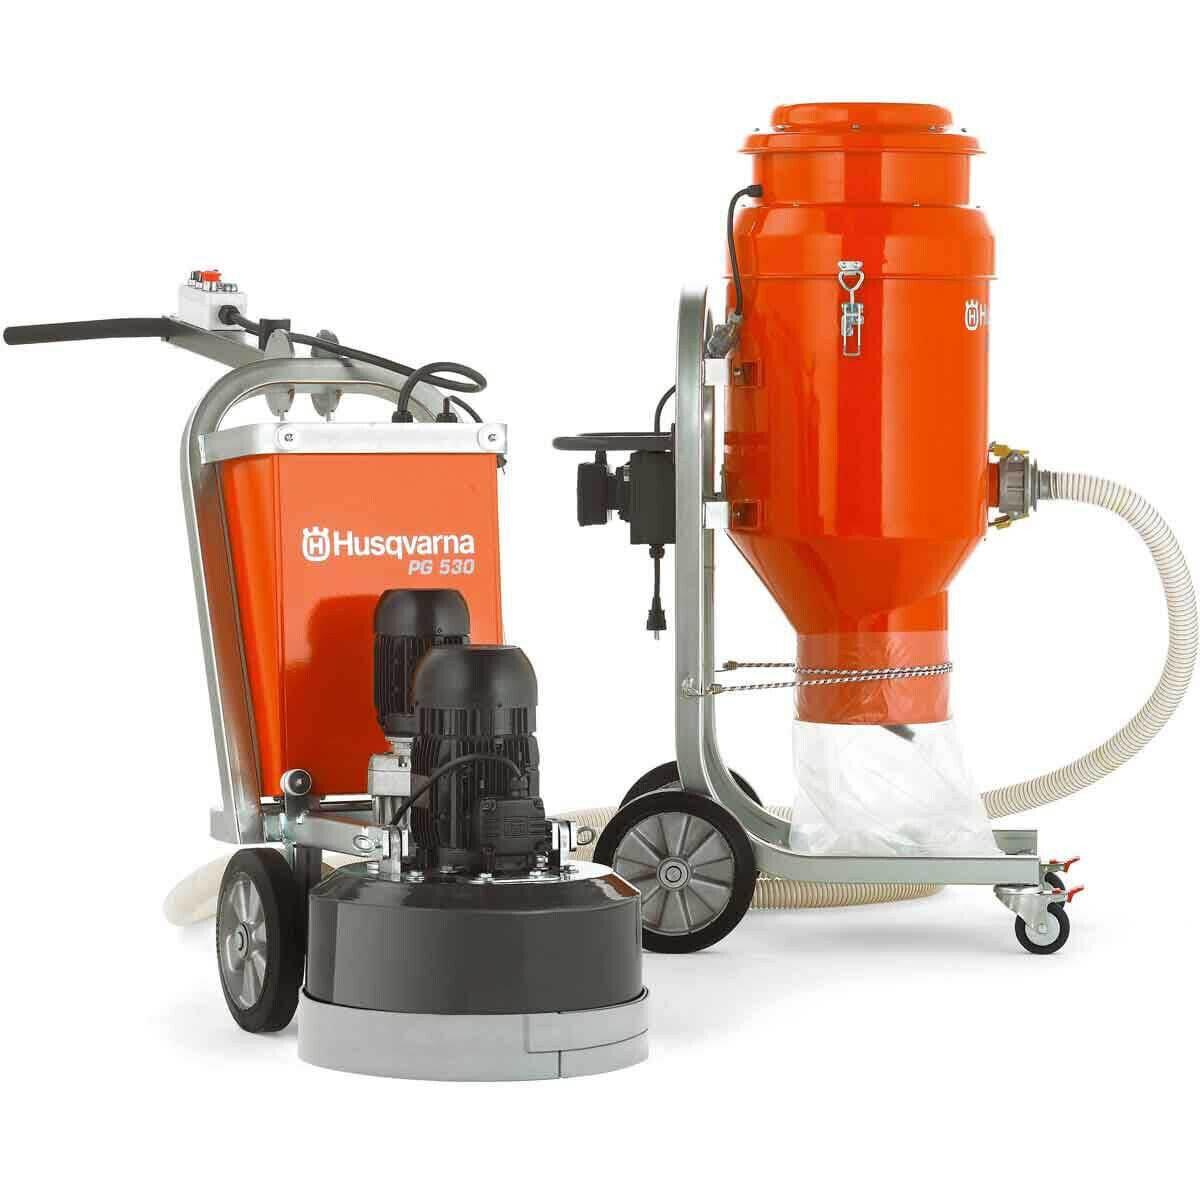 Husqvarna PG530 Grinder and DC 3300 Vacuum